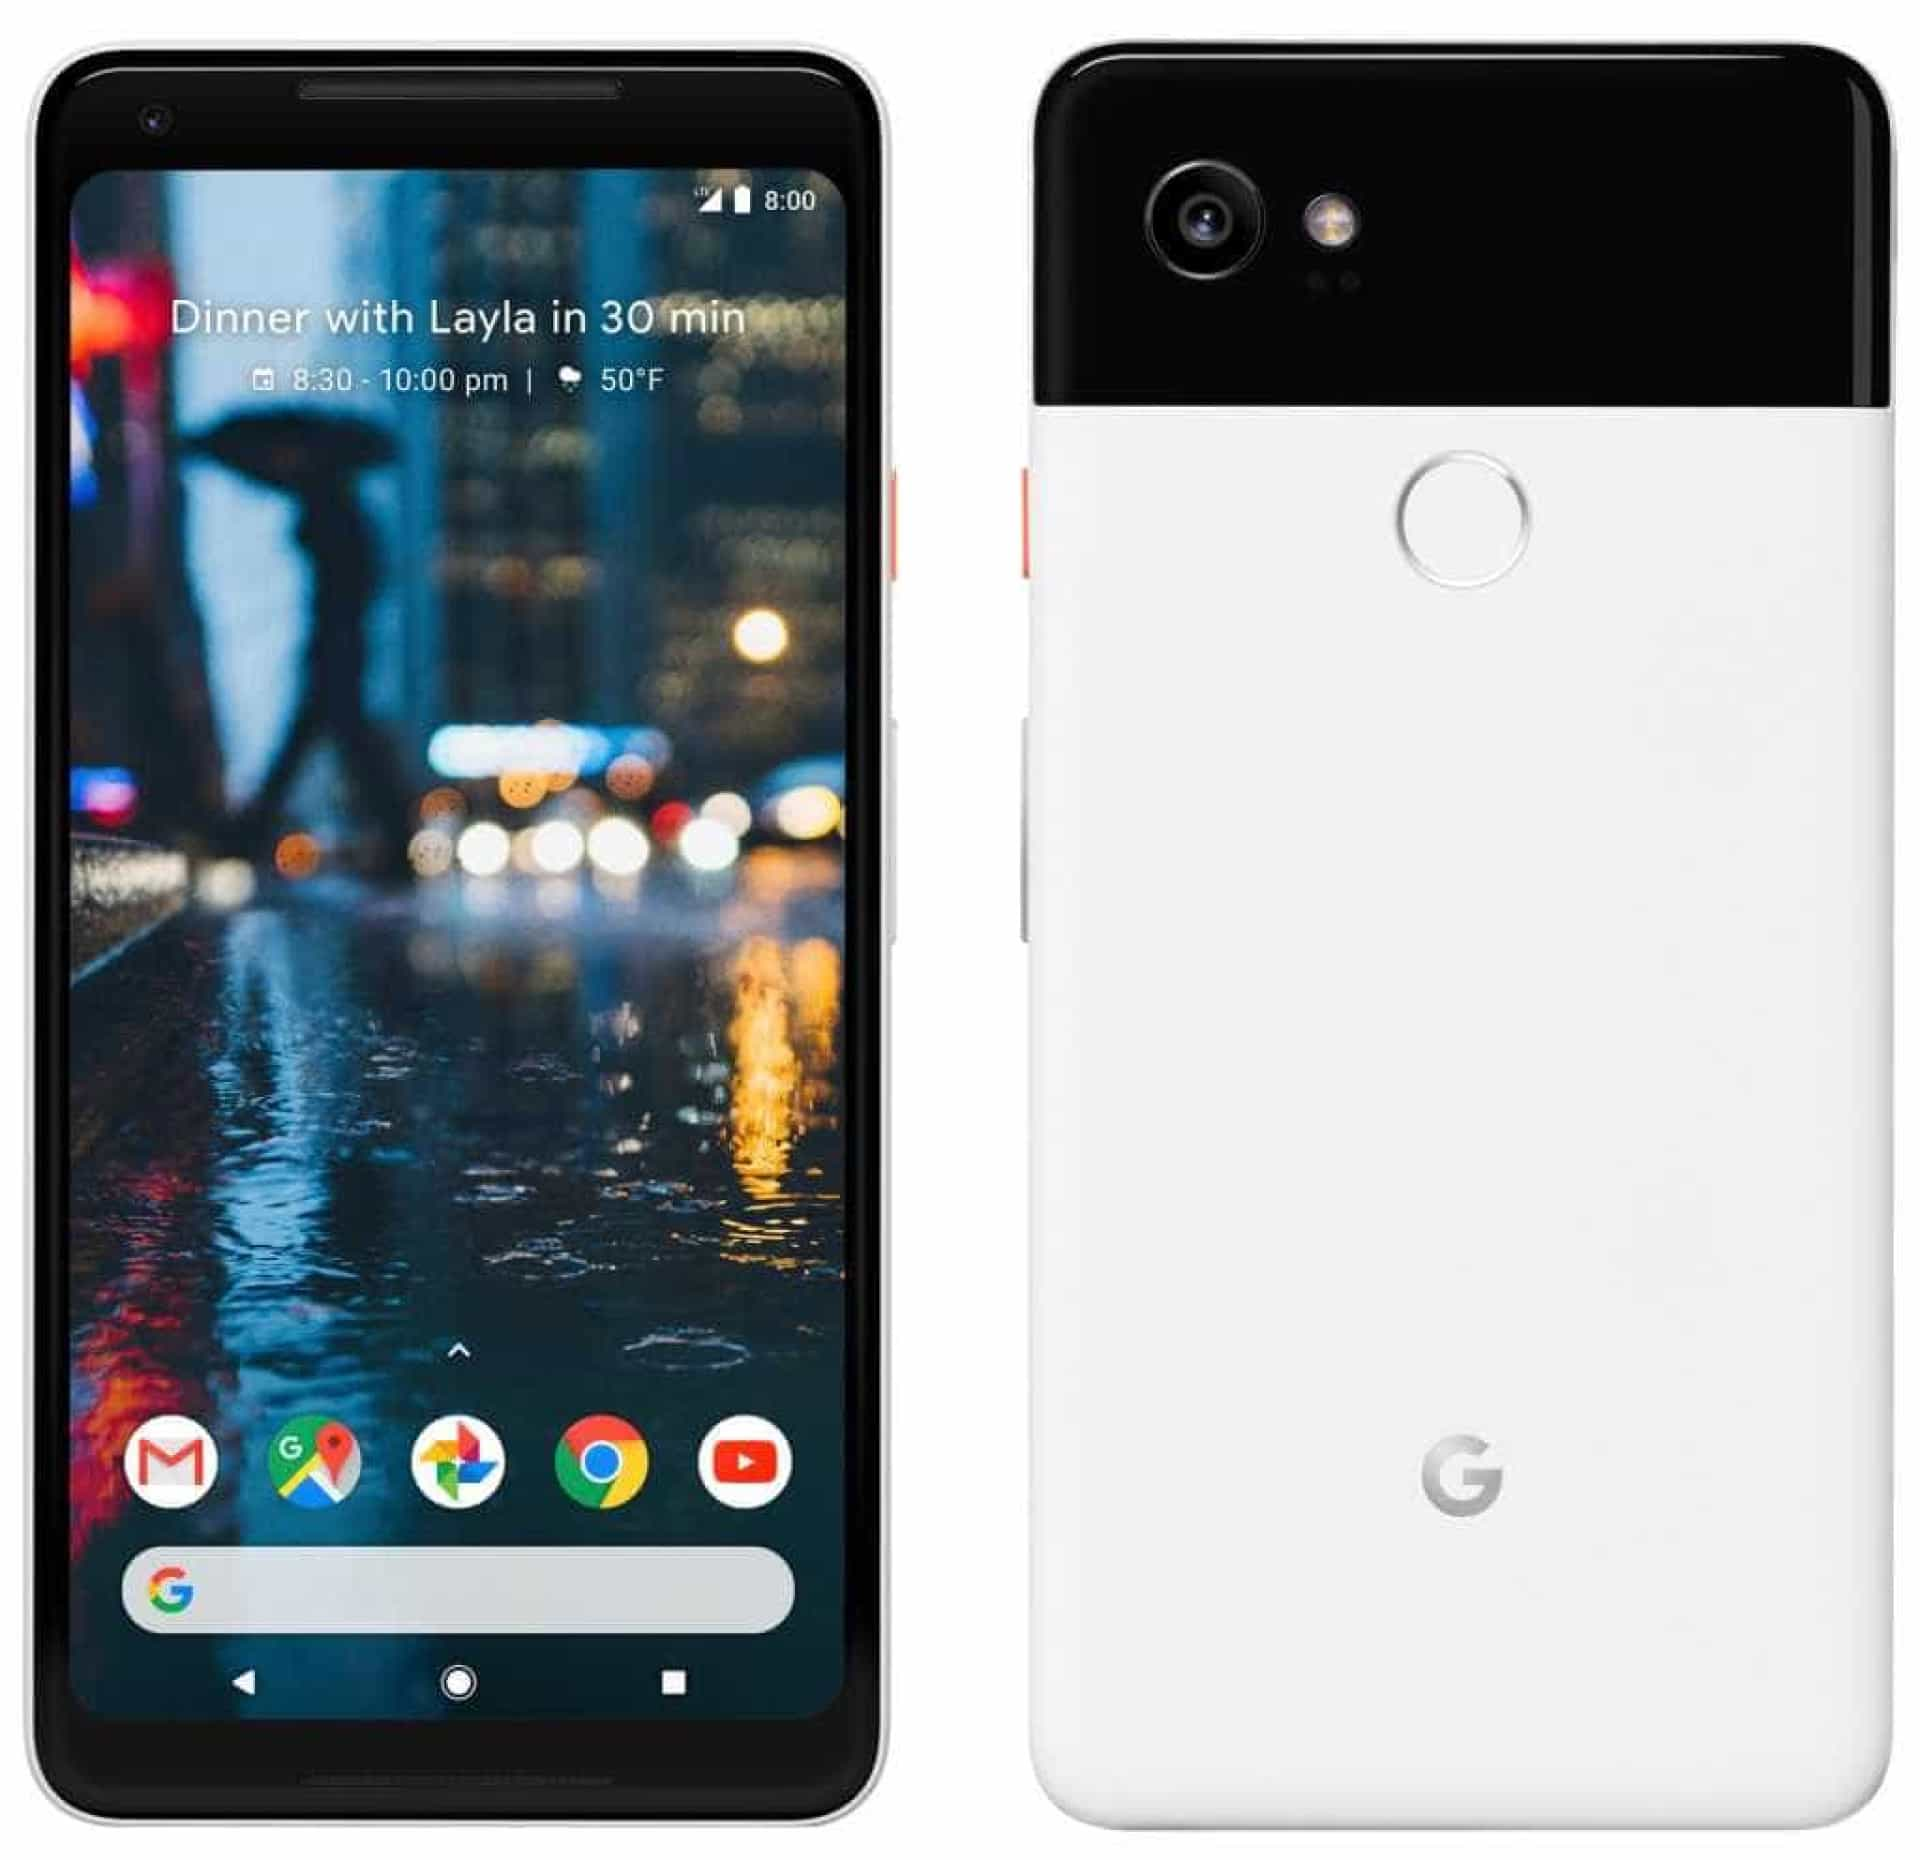 Eis o Pixel 2 XL, o próximo topo de gama da Google